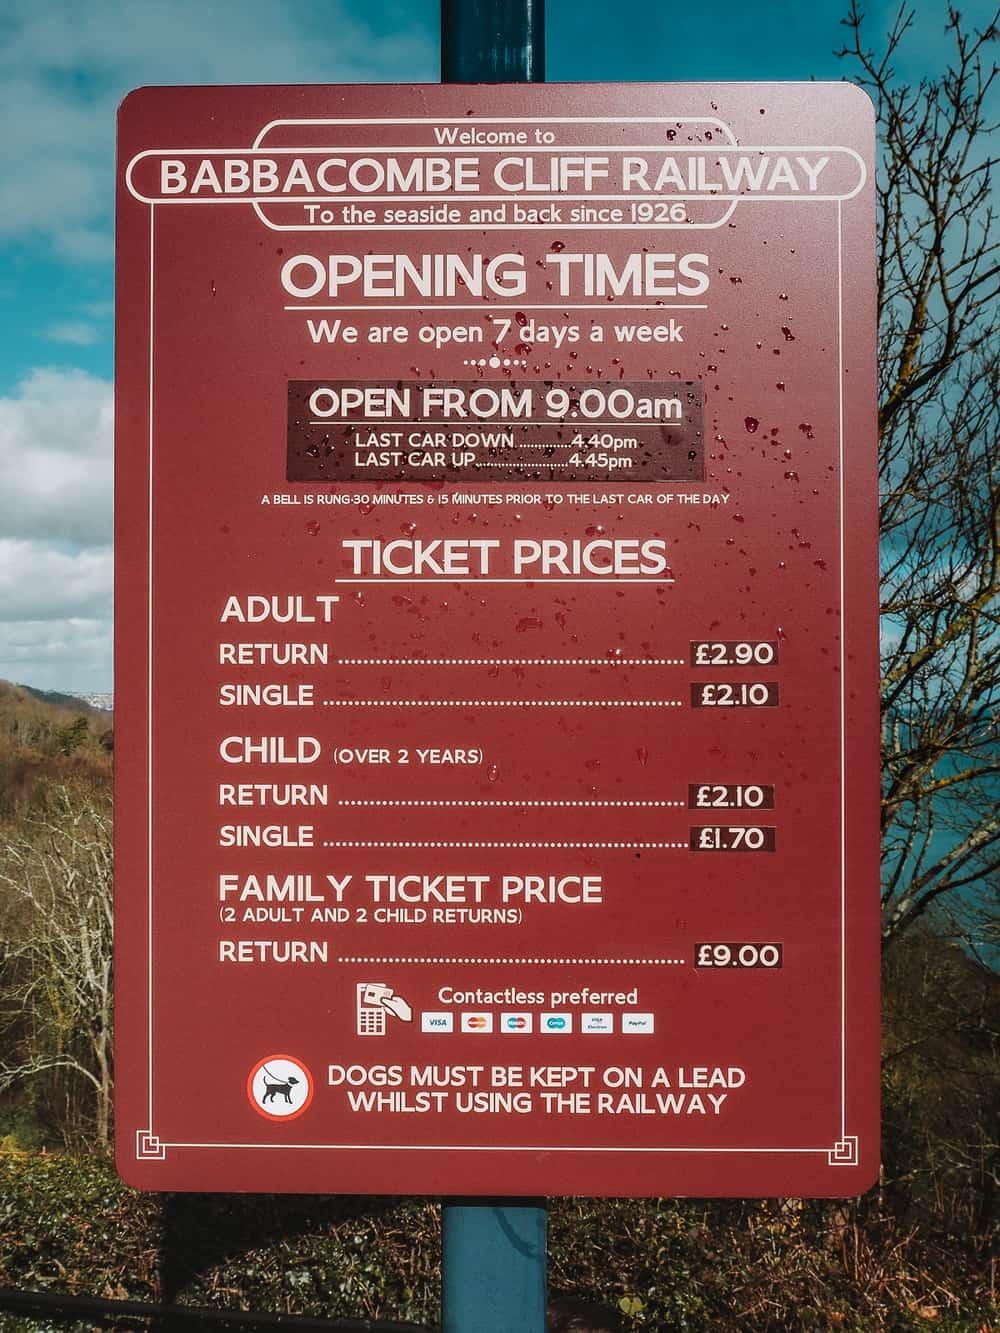 Babbacombe Cliff Railway ticket prices